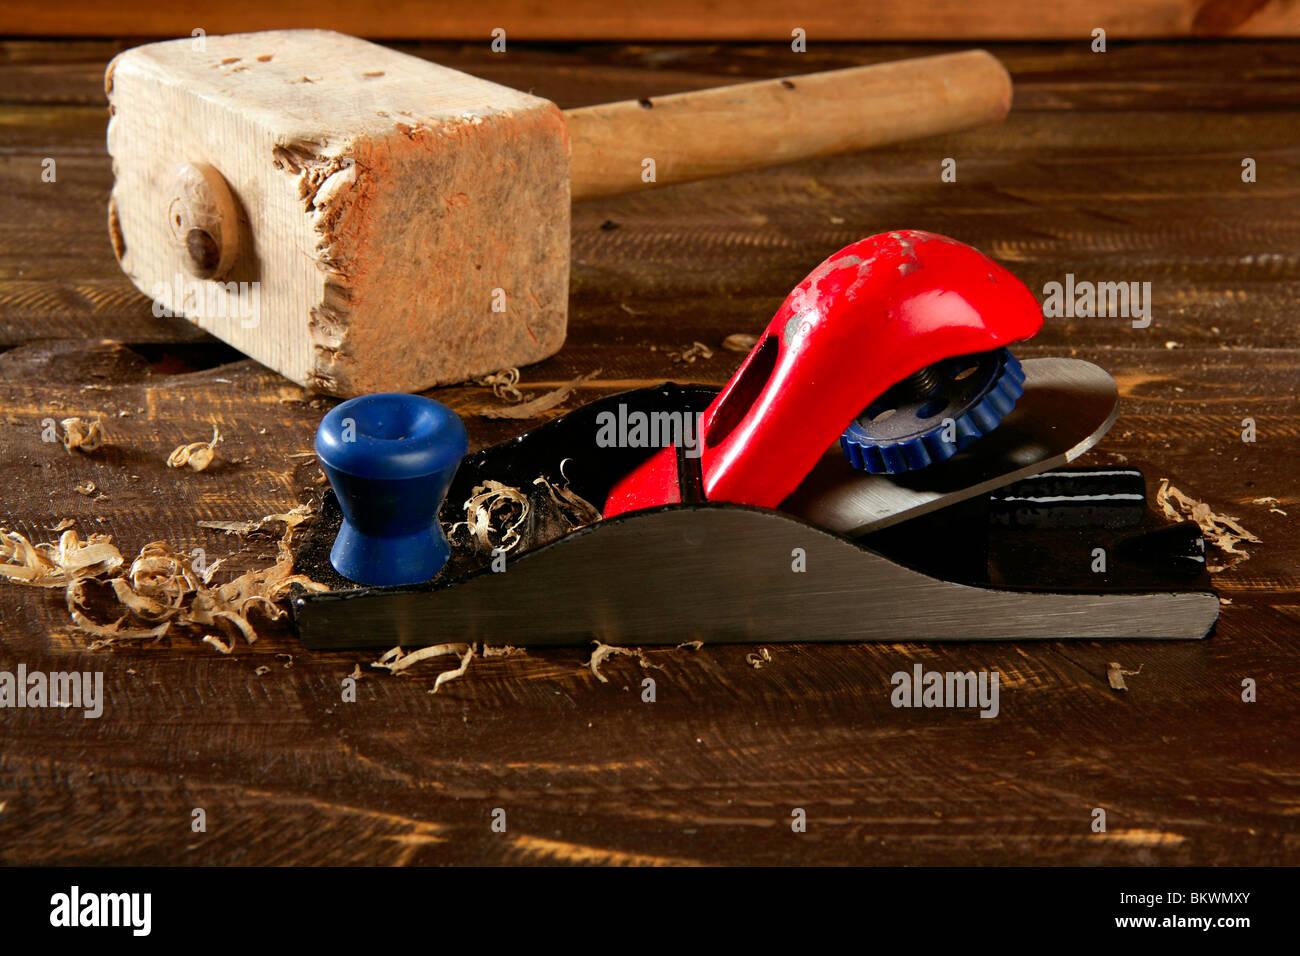 planer carpenter hand tool wood shaving over wooden board - Stock Image